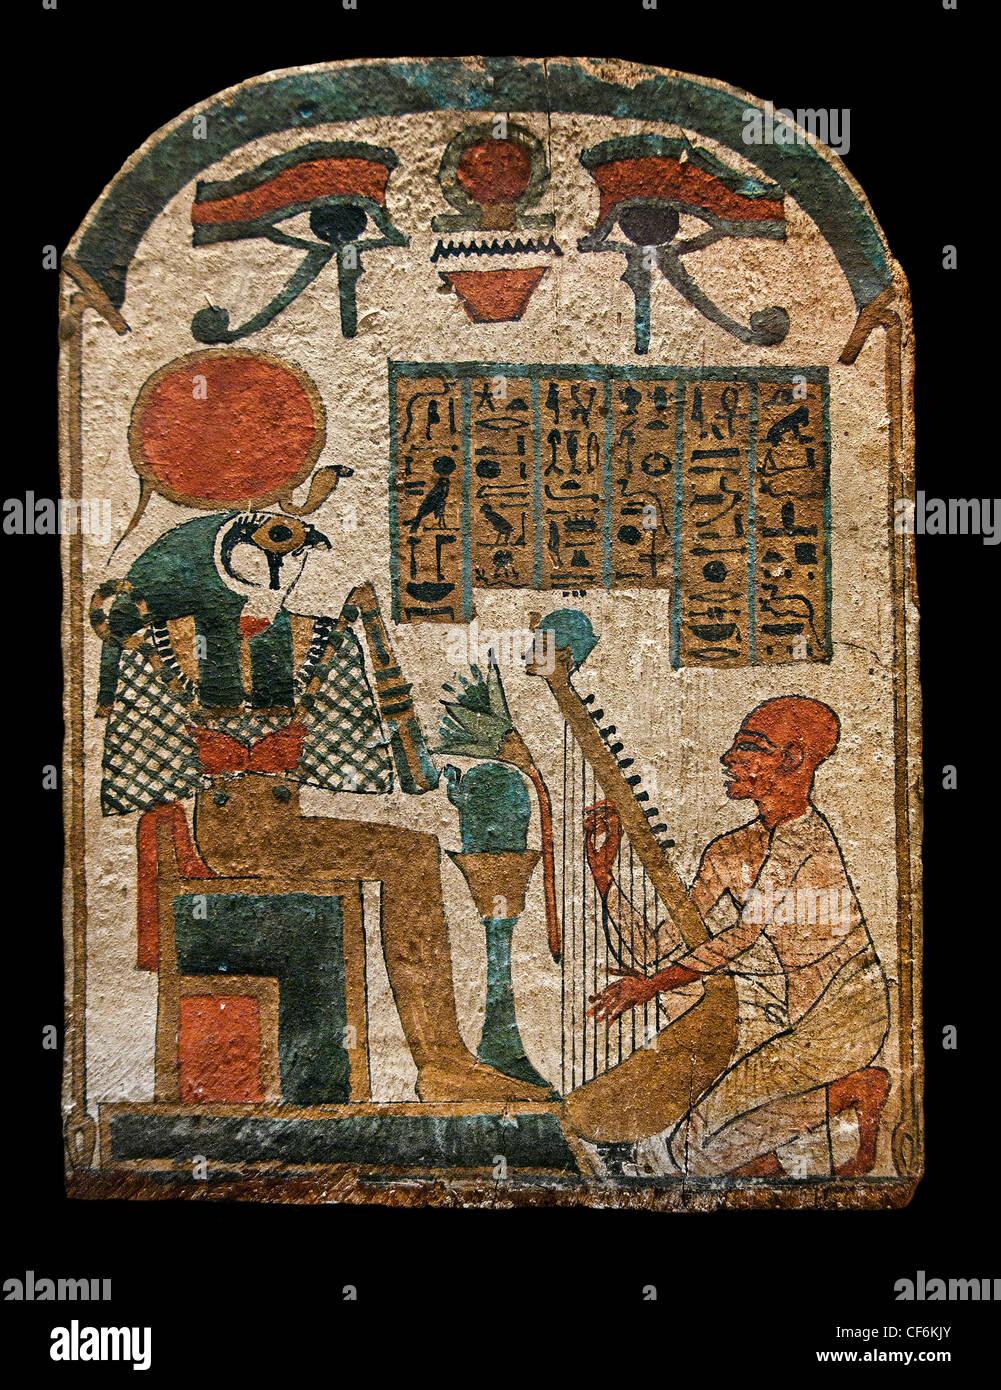 musician Amun - Amon Djedkhonsuiufankh plays the harp before god Re Horakhty 3 Period 1069 - 664 BC Egypt Egyptian - Stock Image